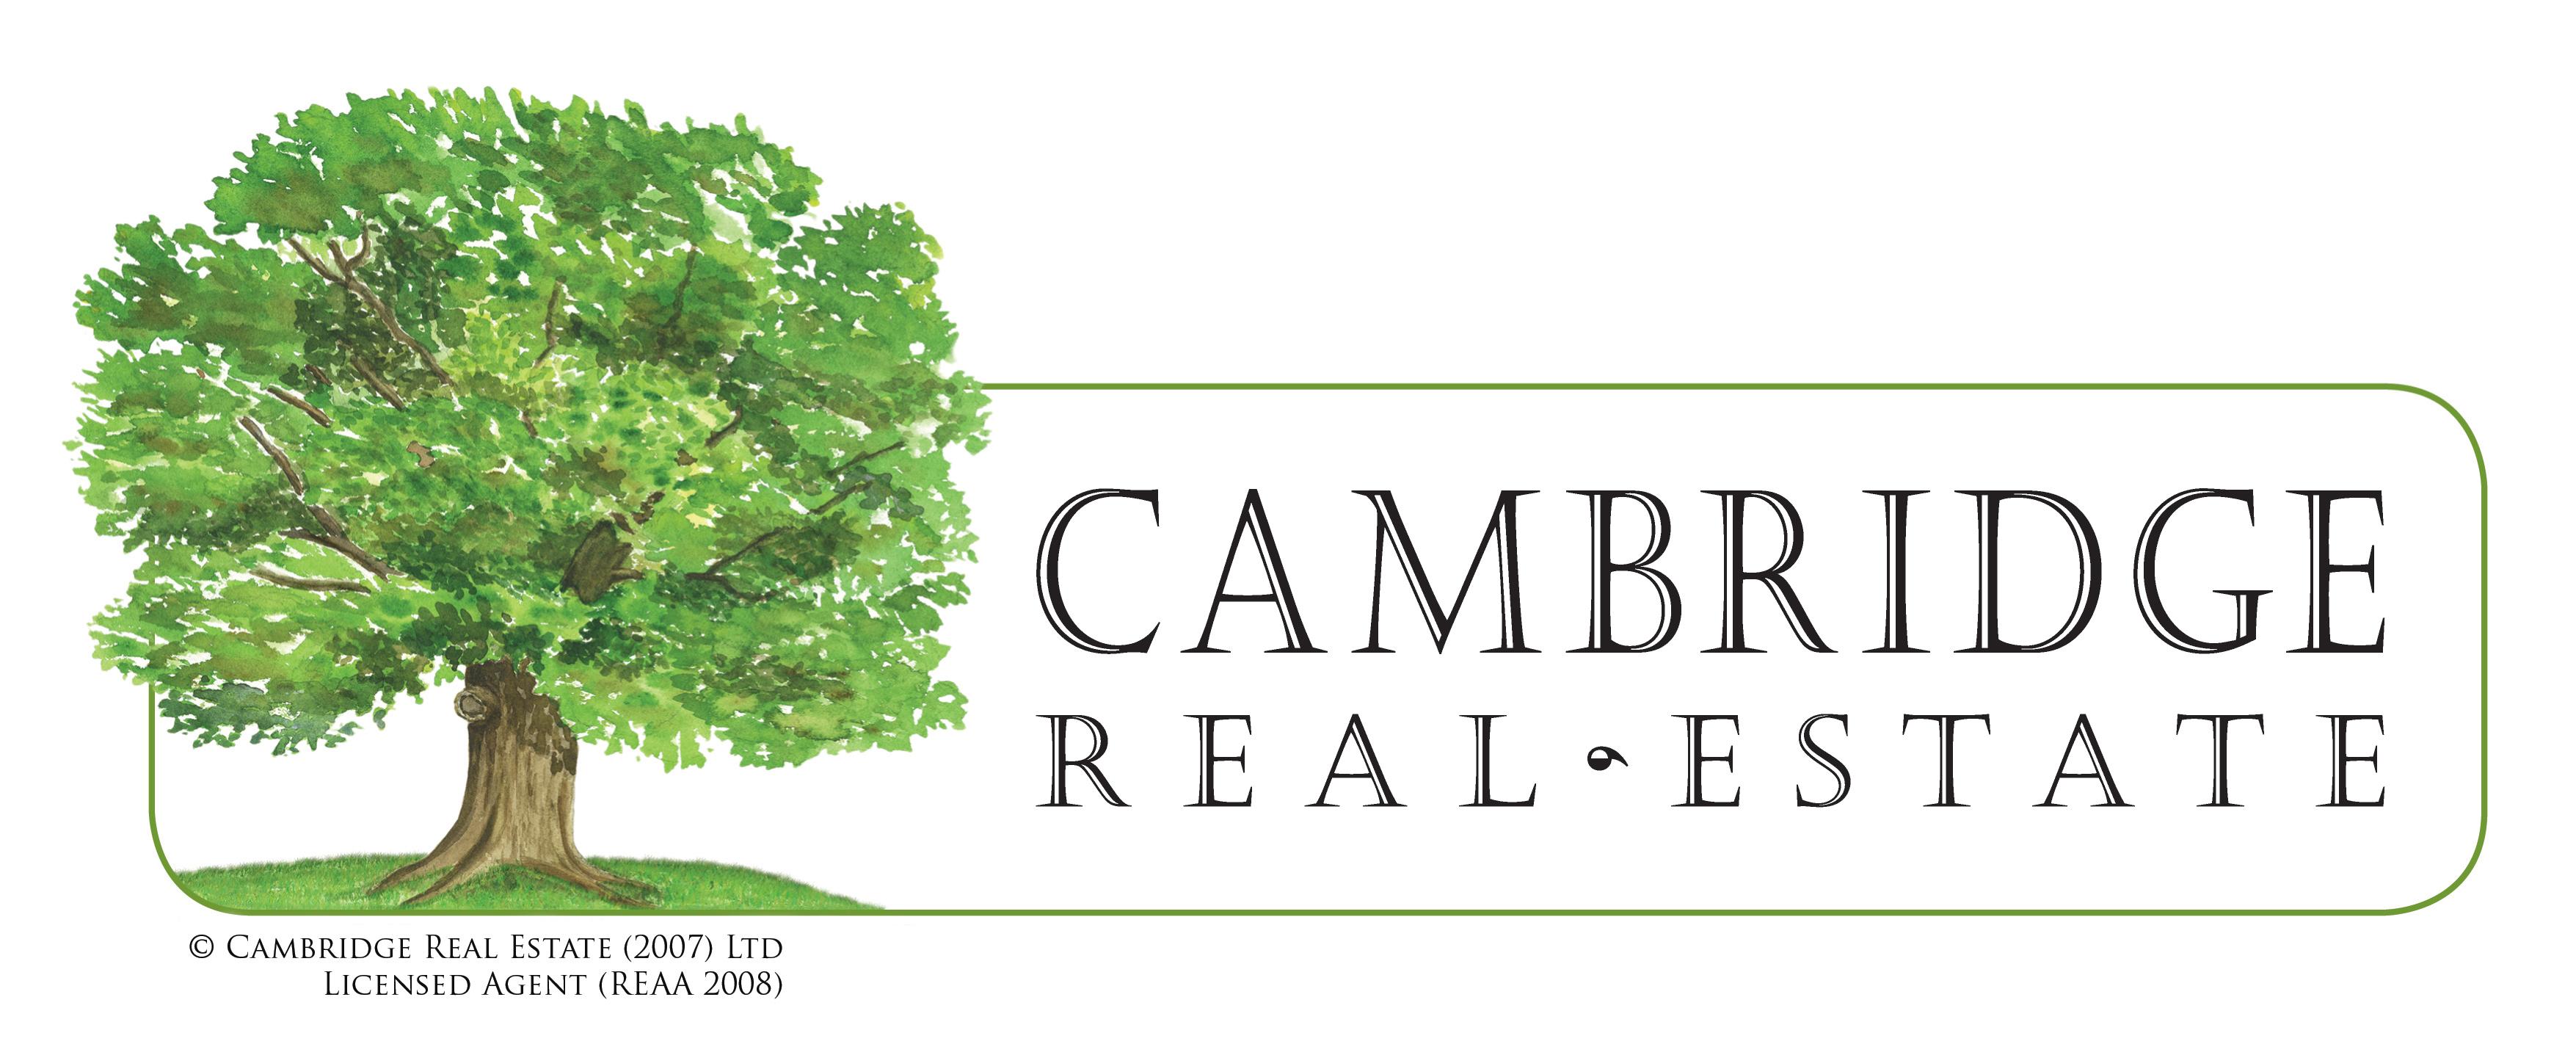 Cambridge Real Estate - Cambridge